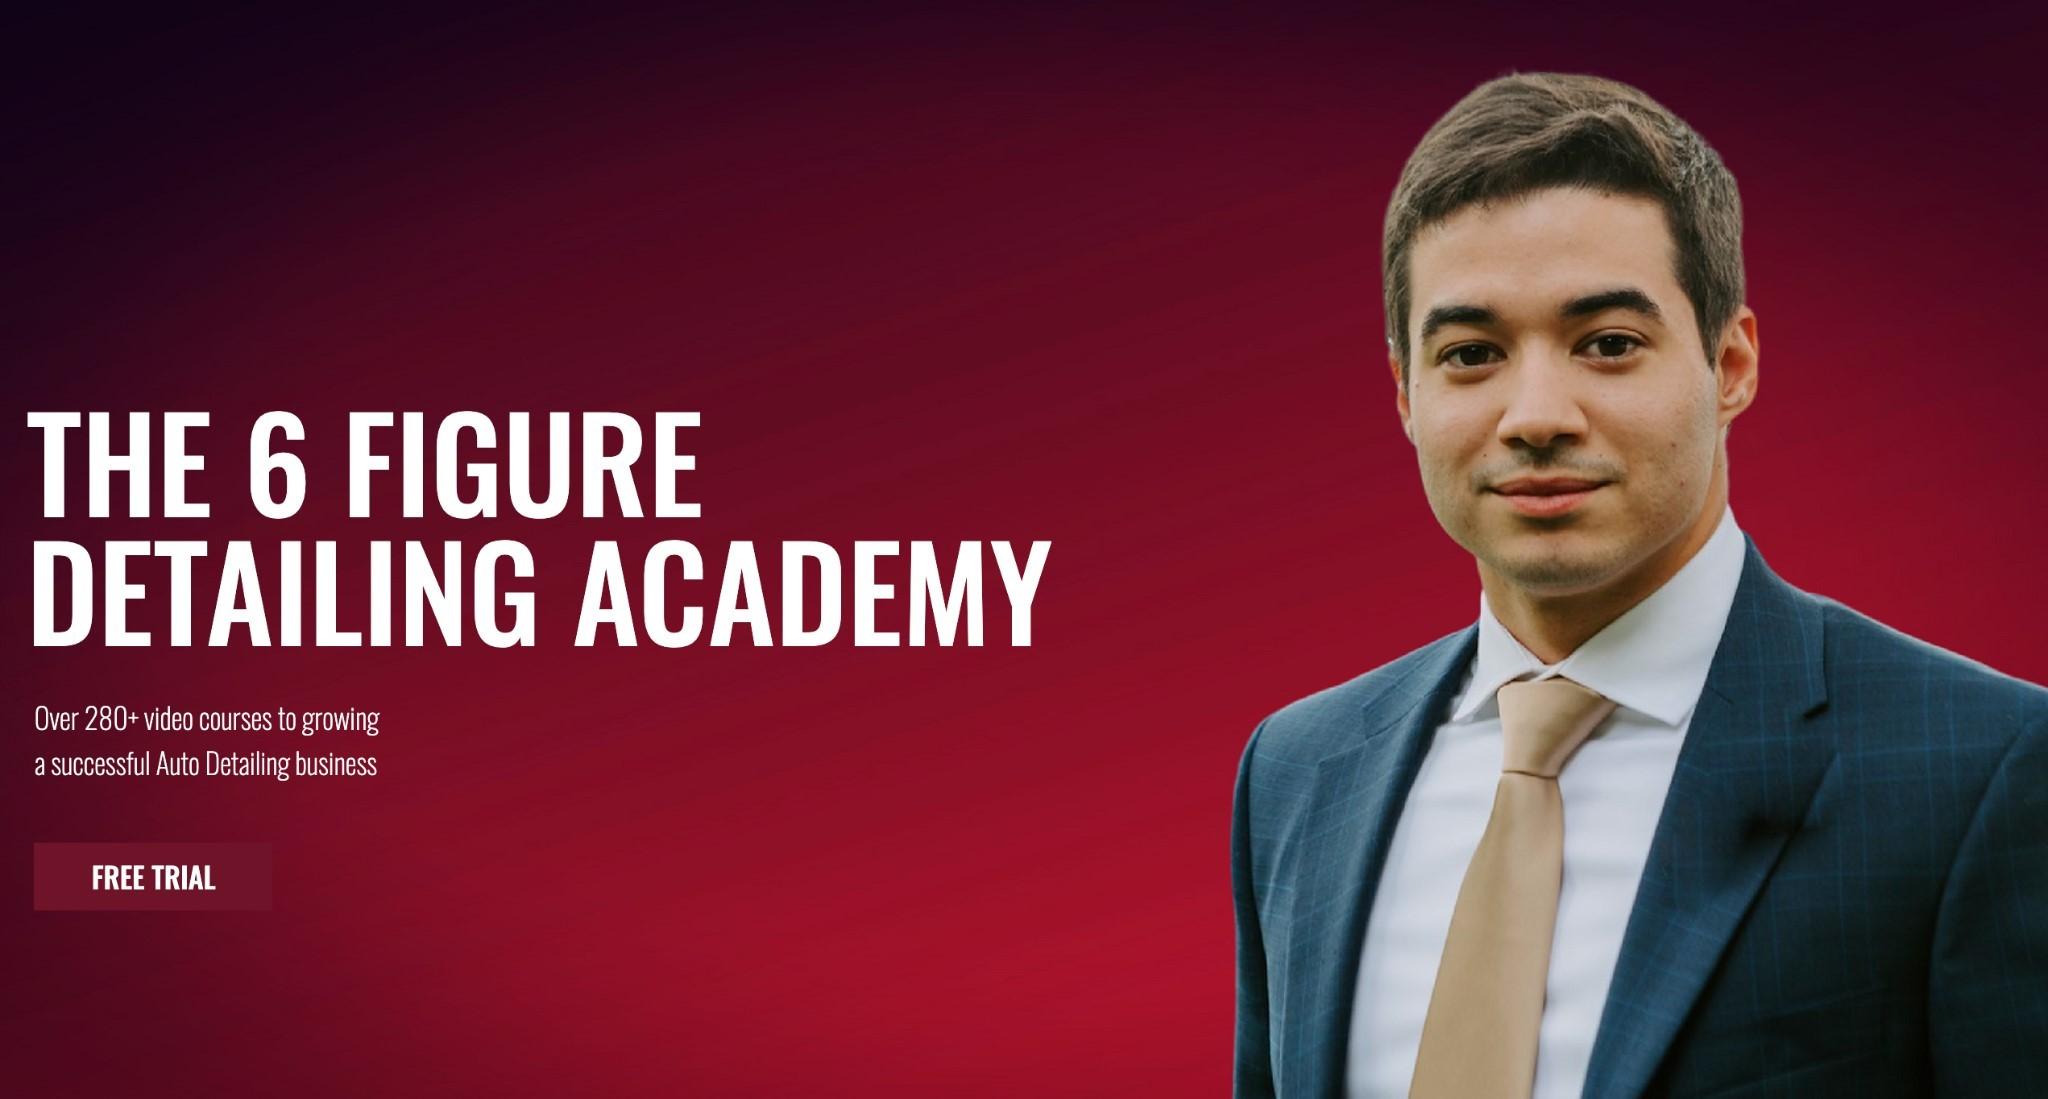 Mezalira Academy shares how to start an Auto Detailing business